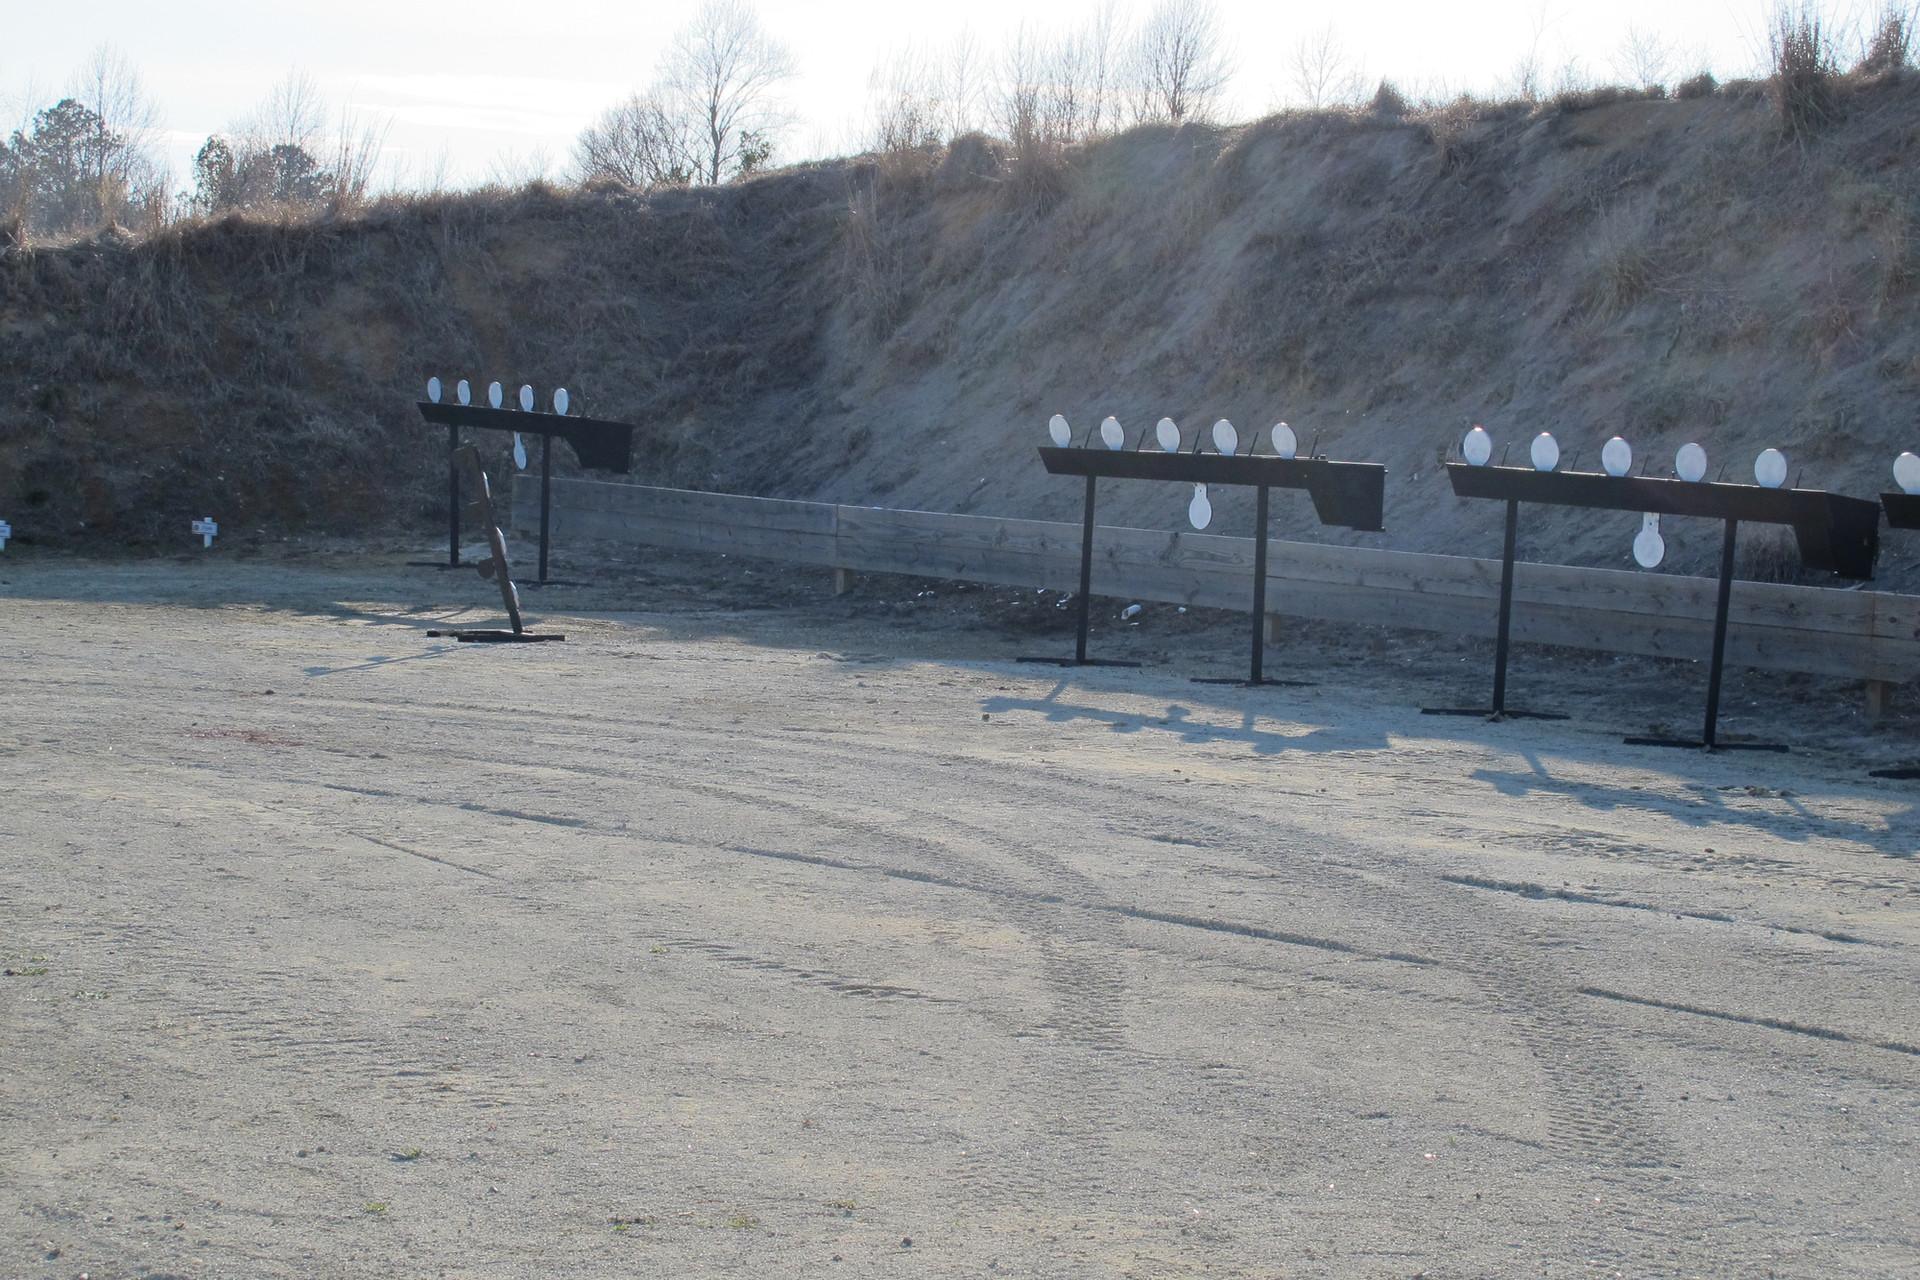 Range 3 Targets